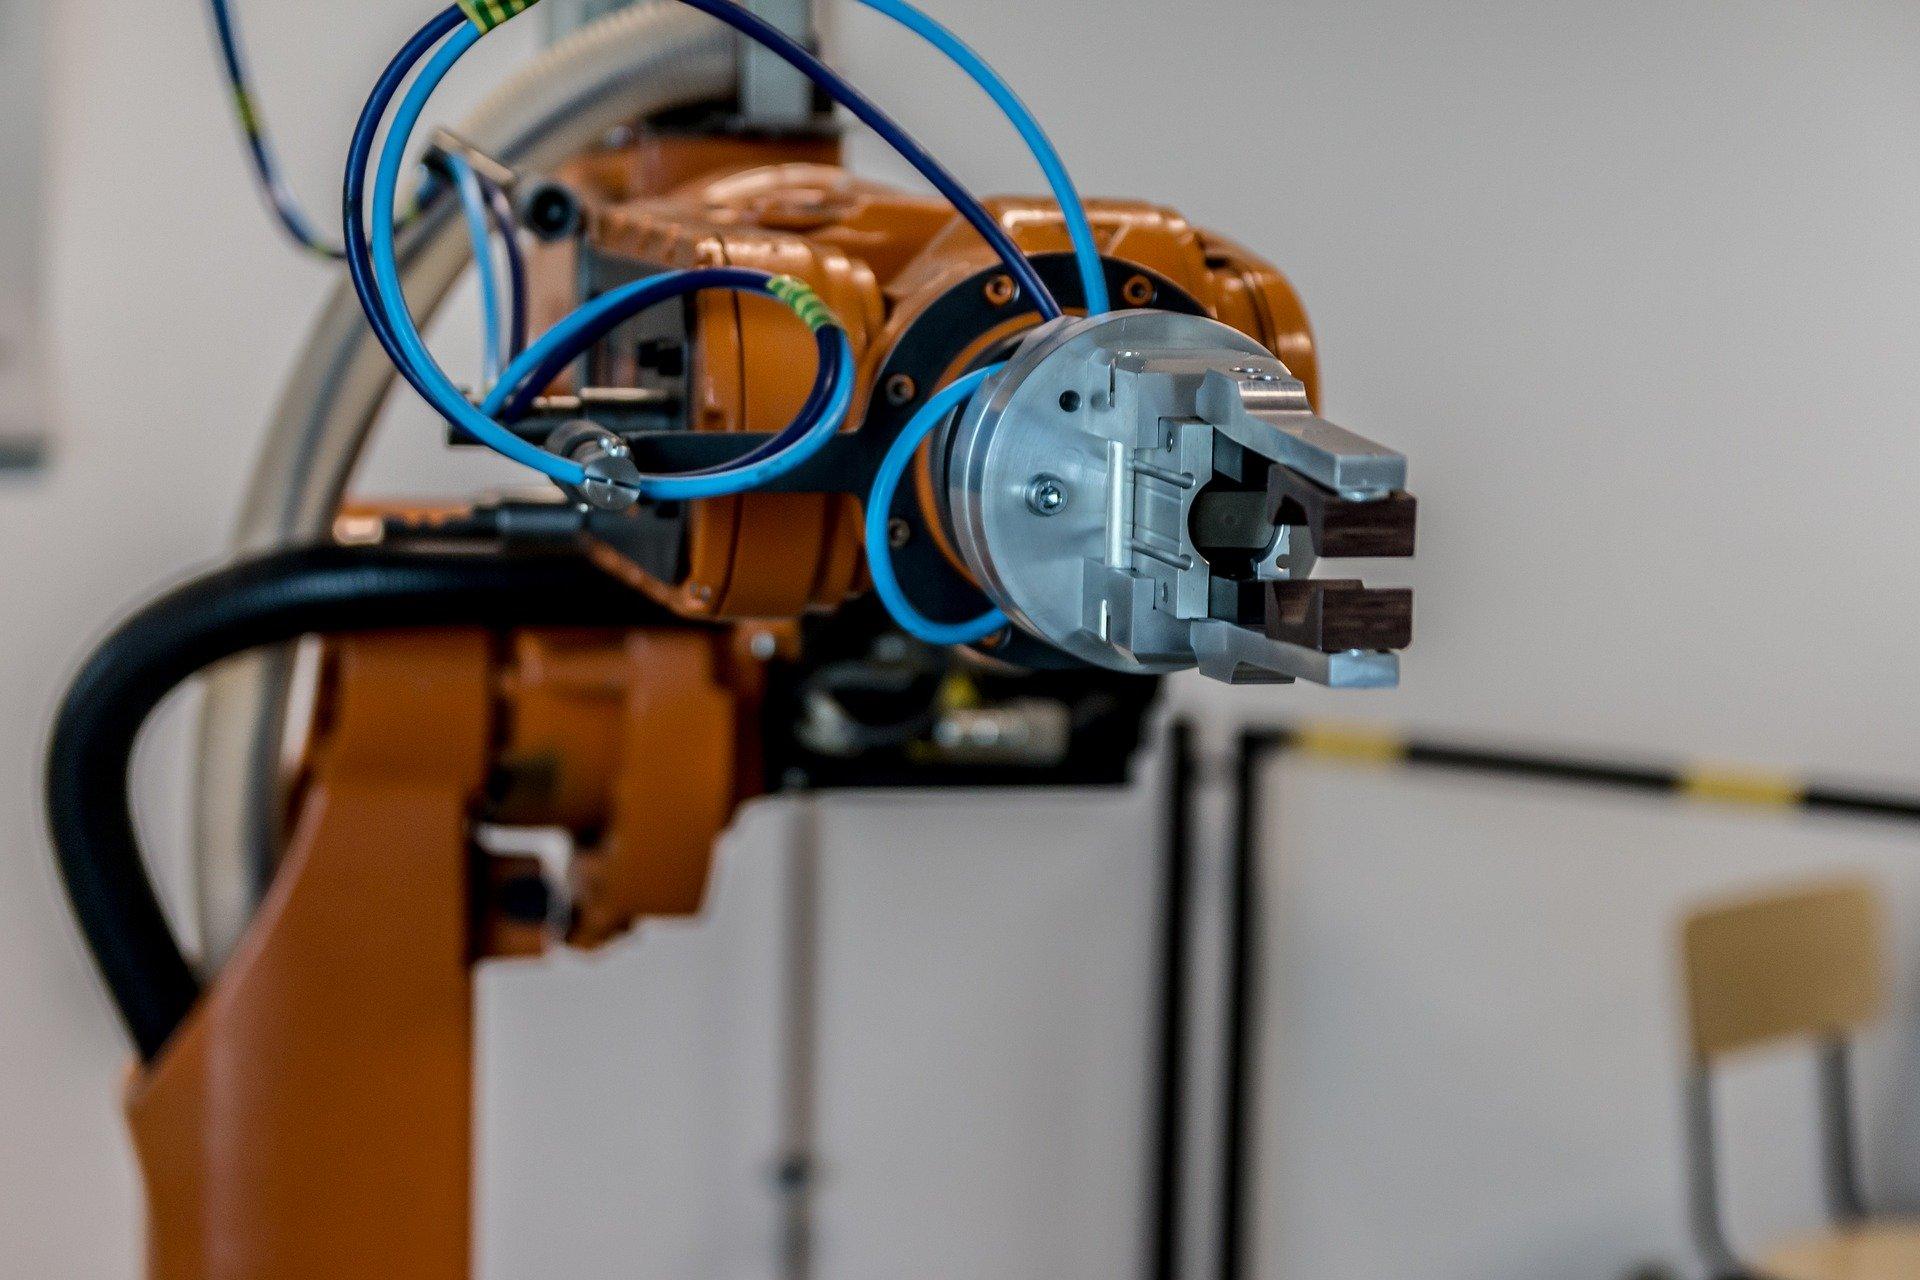 Brazo robótico naranja